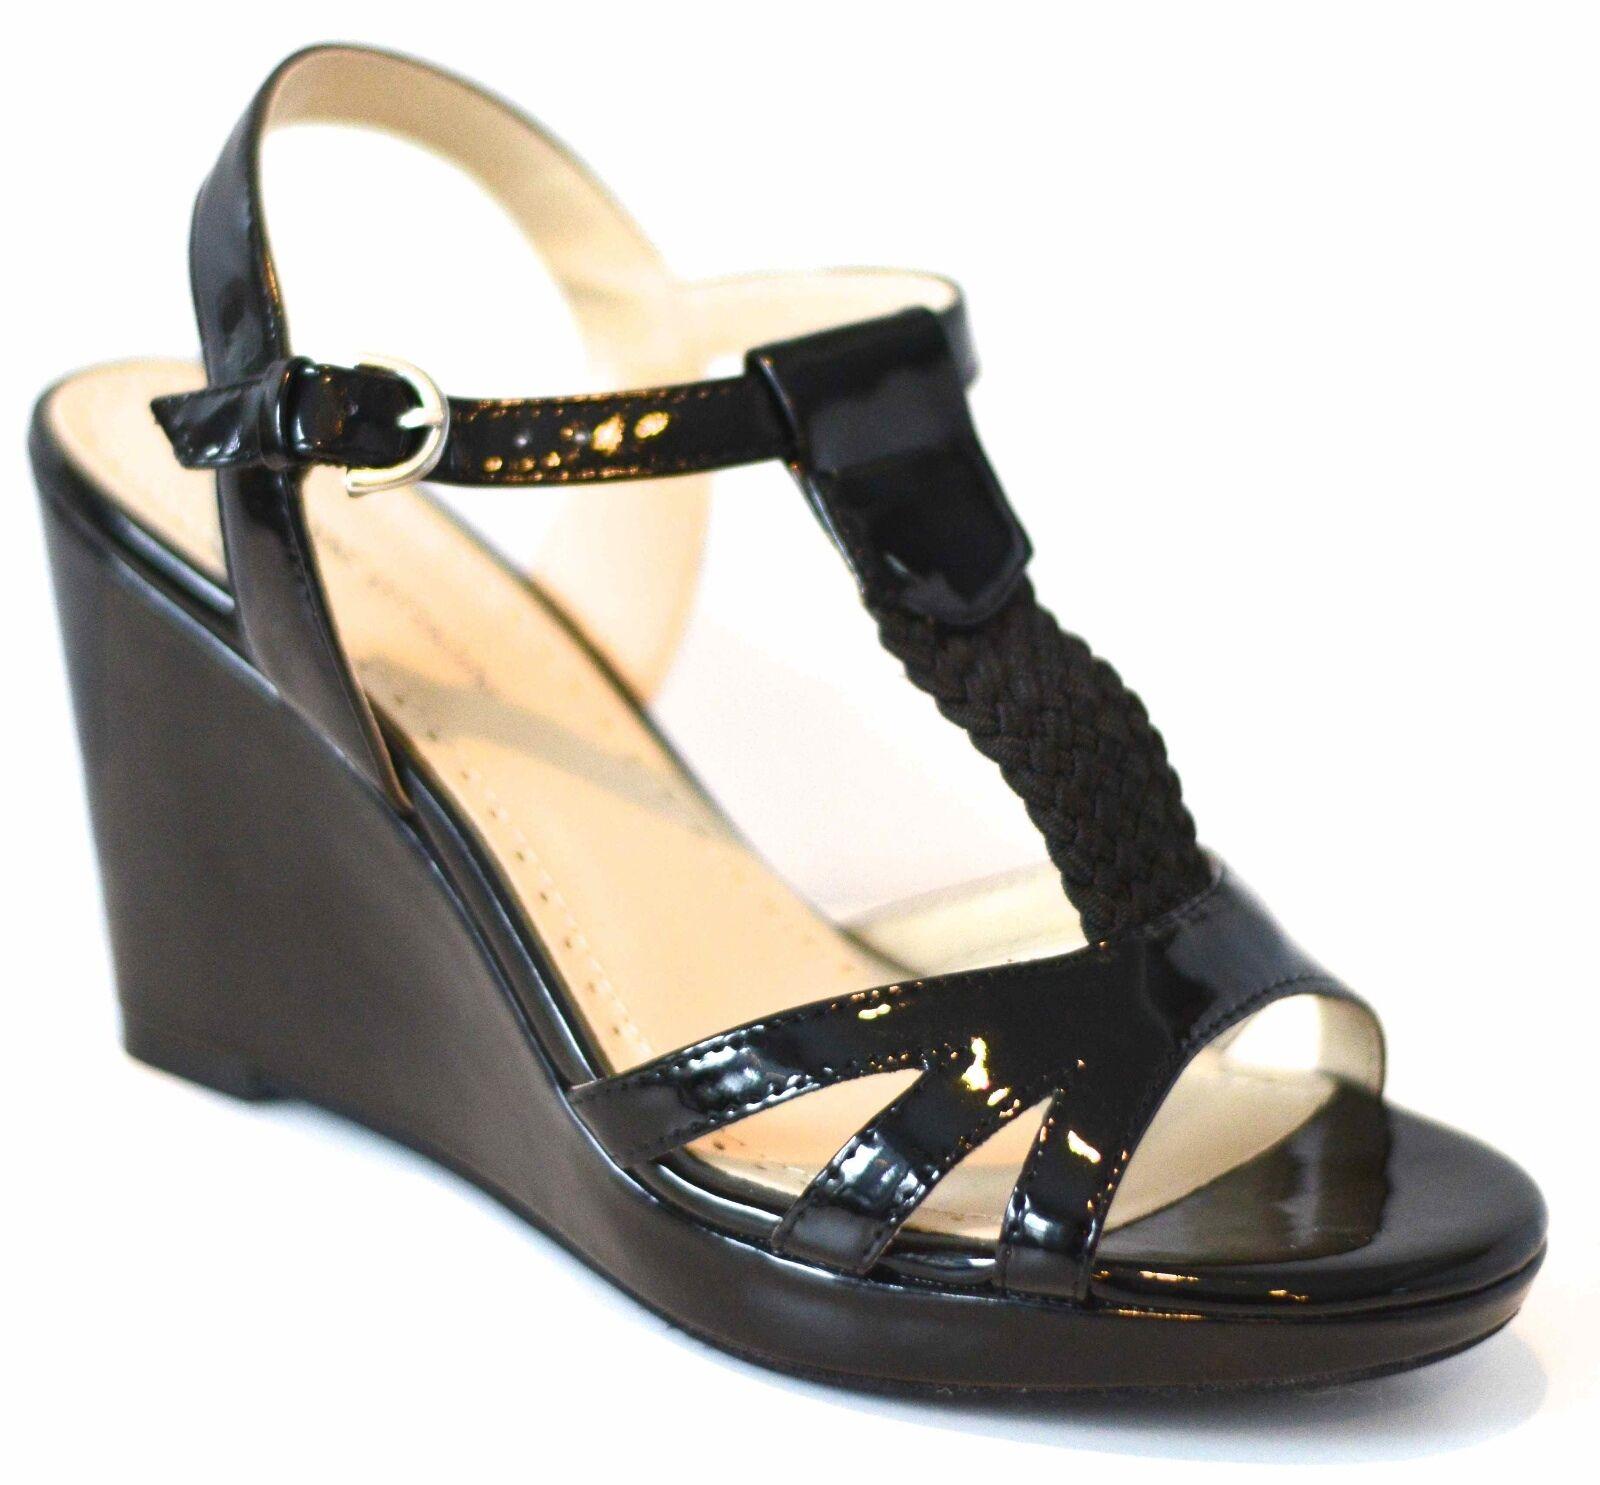 Adrienne Vittadini Clovis Womens Womens Clovis Size 10 Black Wedge Sandals Shoes Patent 36d10f